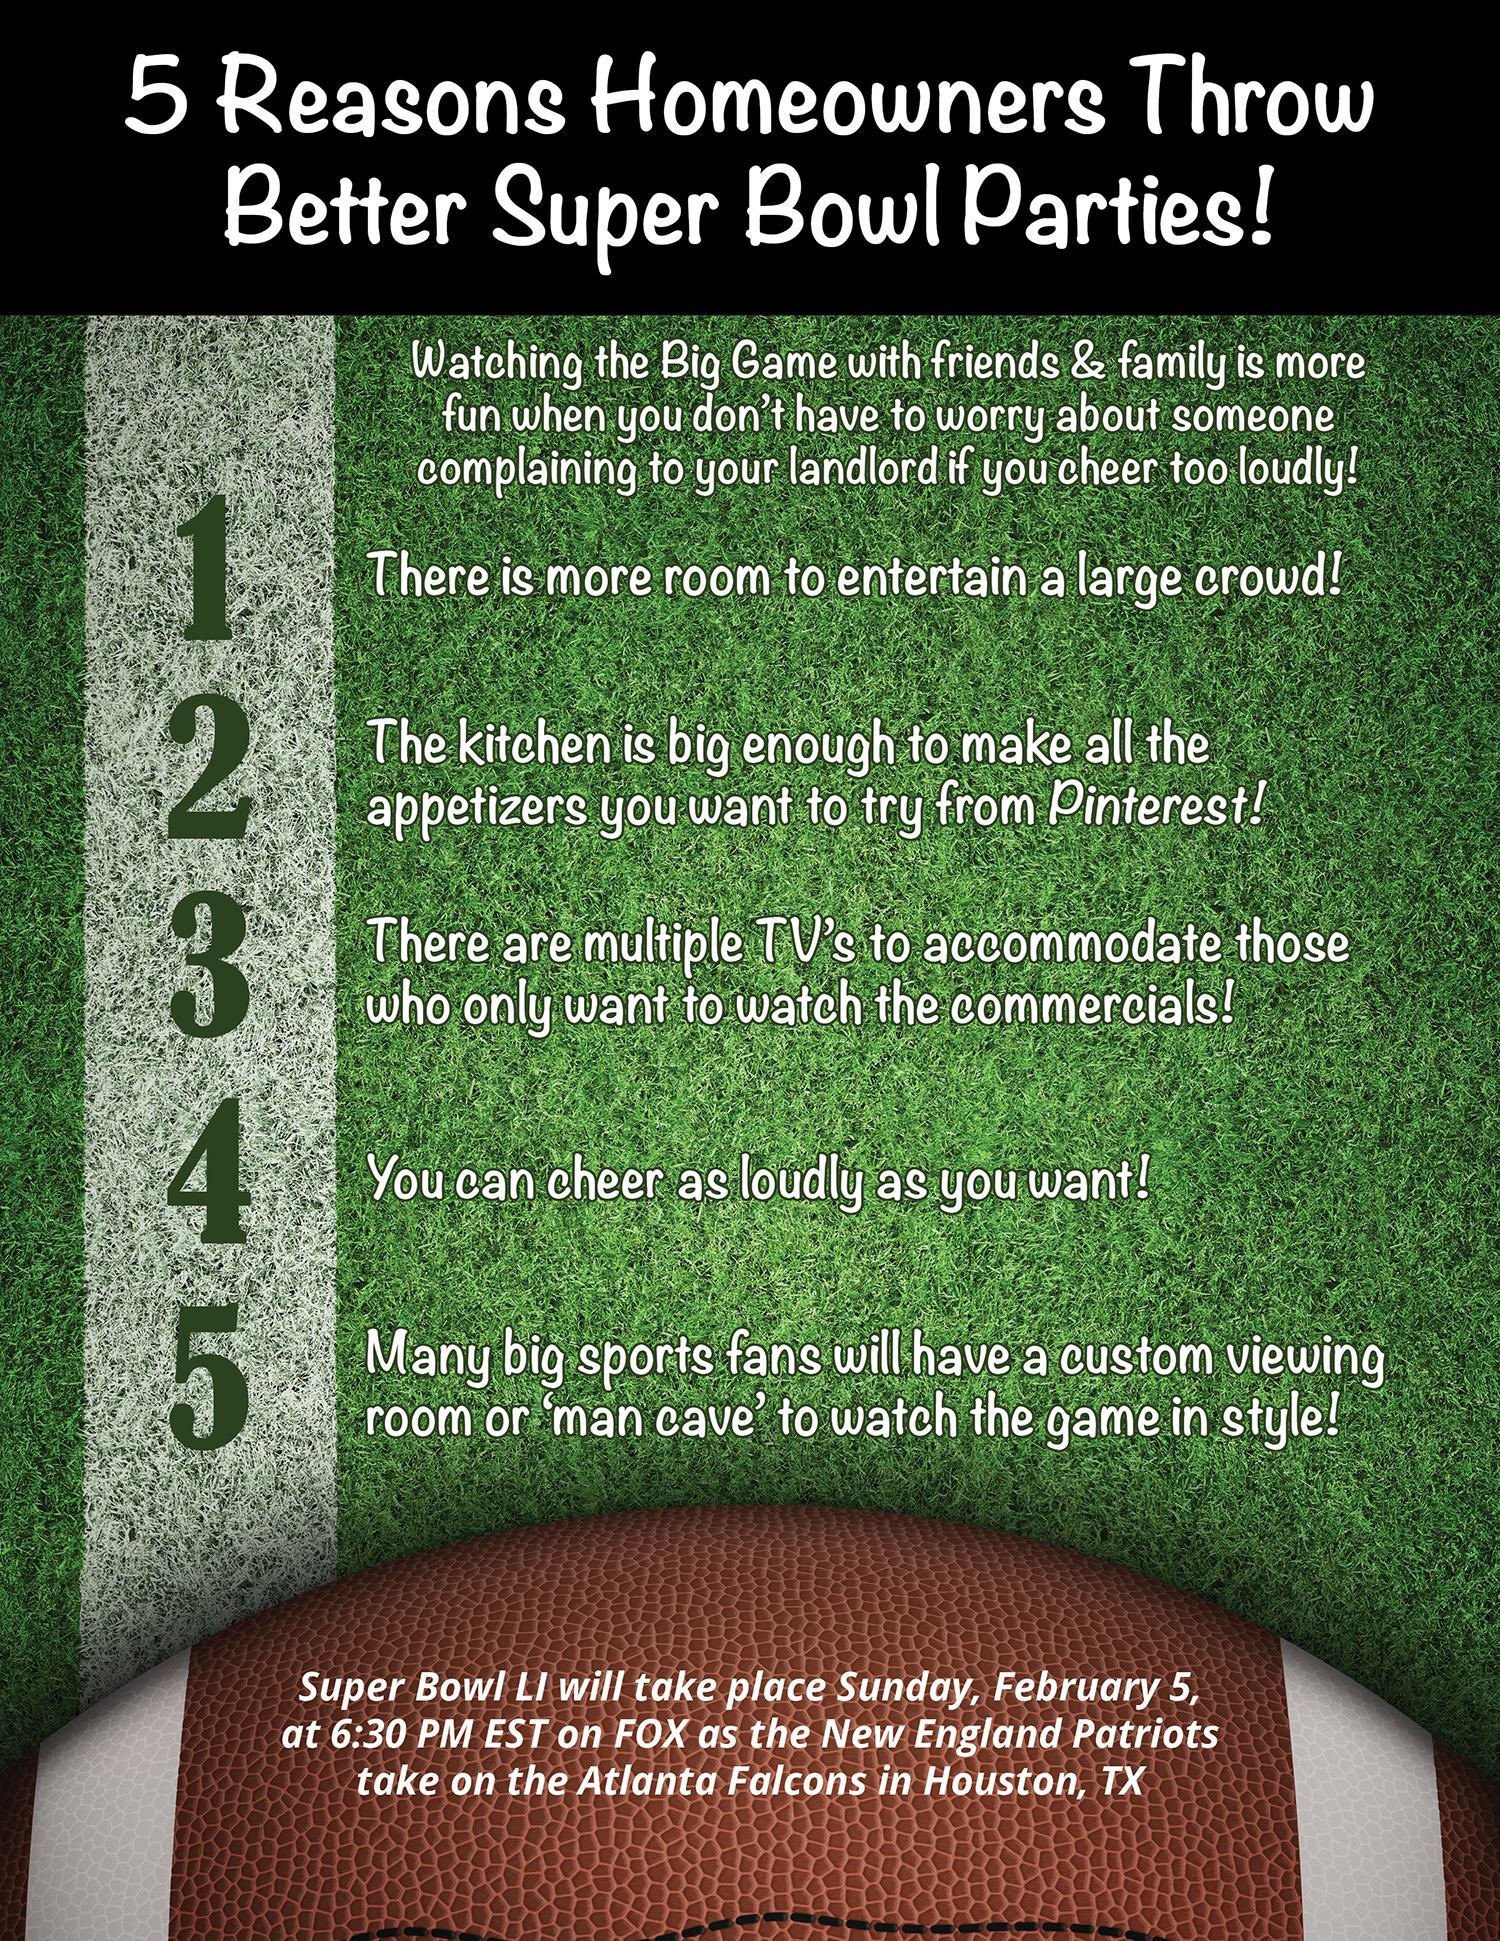 5 Reasons Homeowners Throw Better Super Bowl Parties! [INFOGRAPHIC] | Bridge Builders